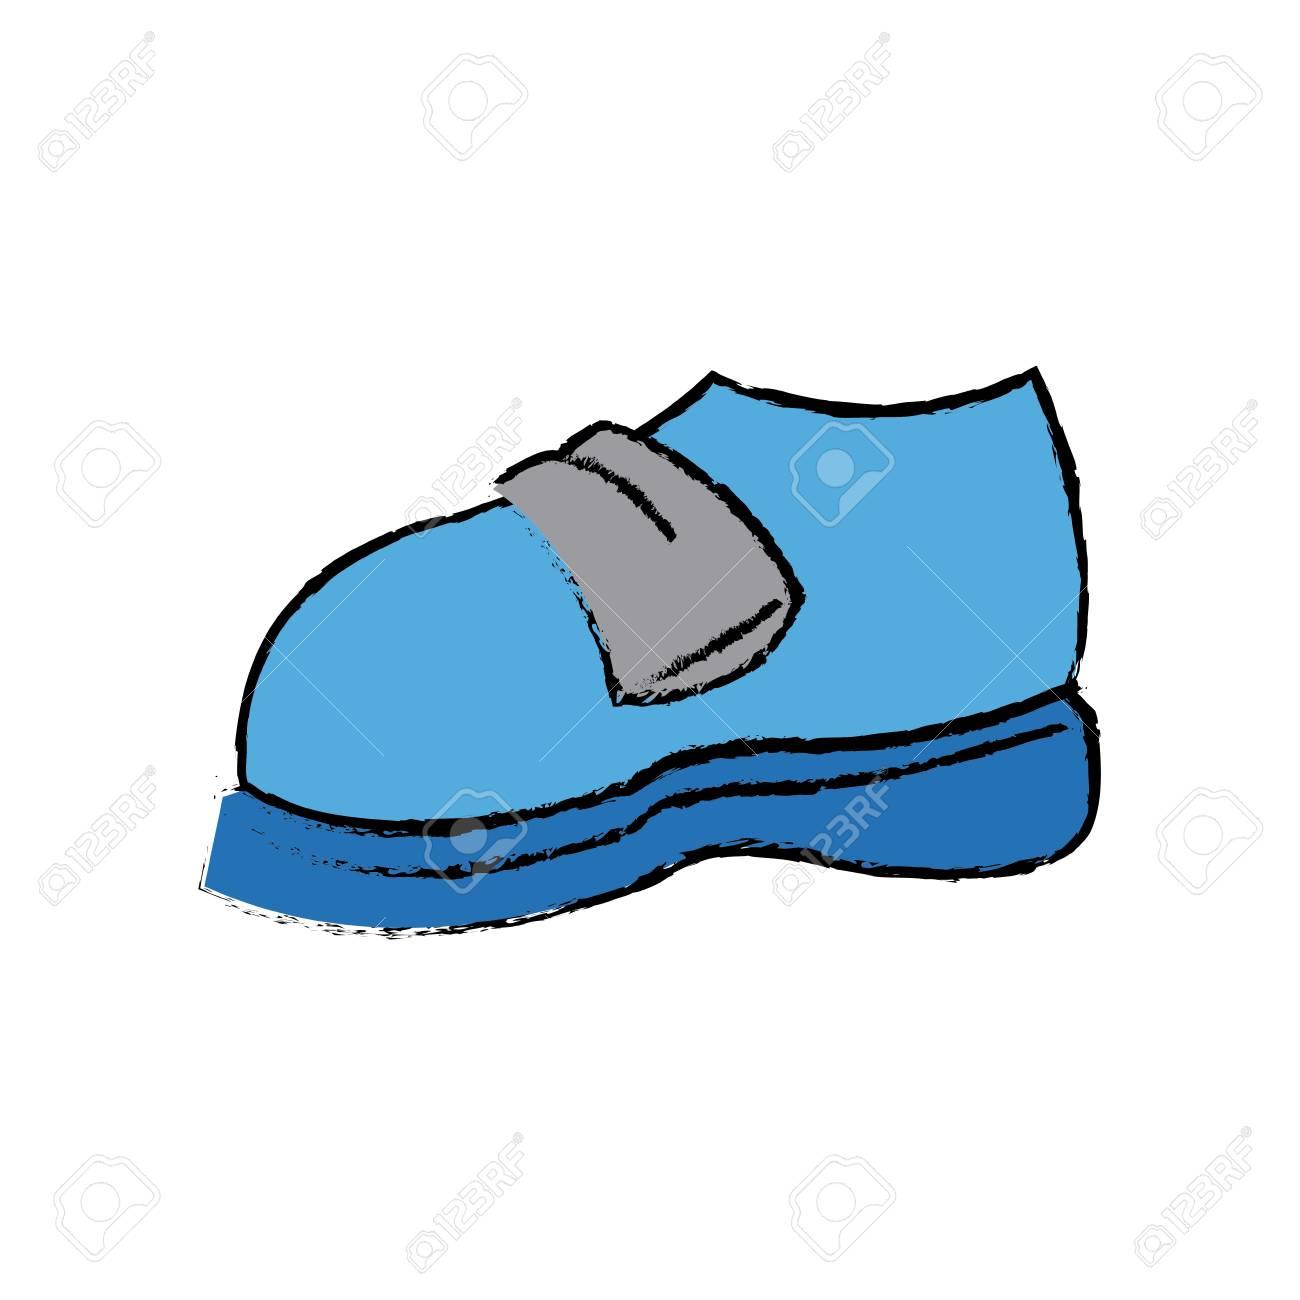 Dessin animé bleu sneaker sport chaussure illustration vectorielle